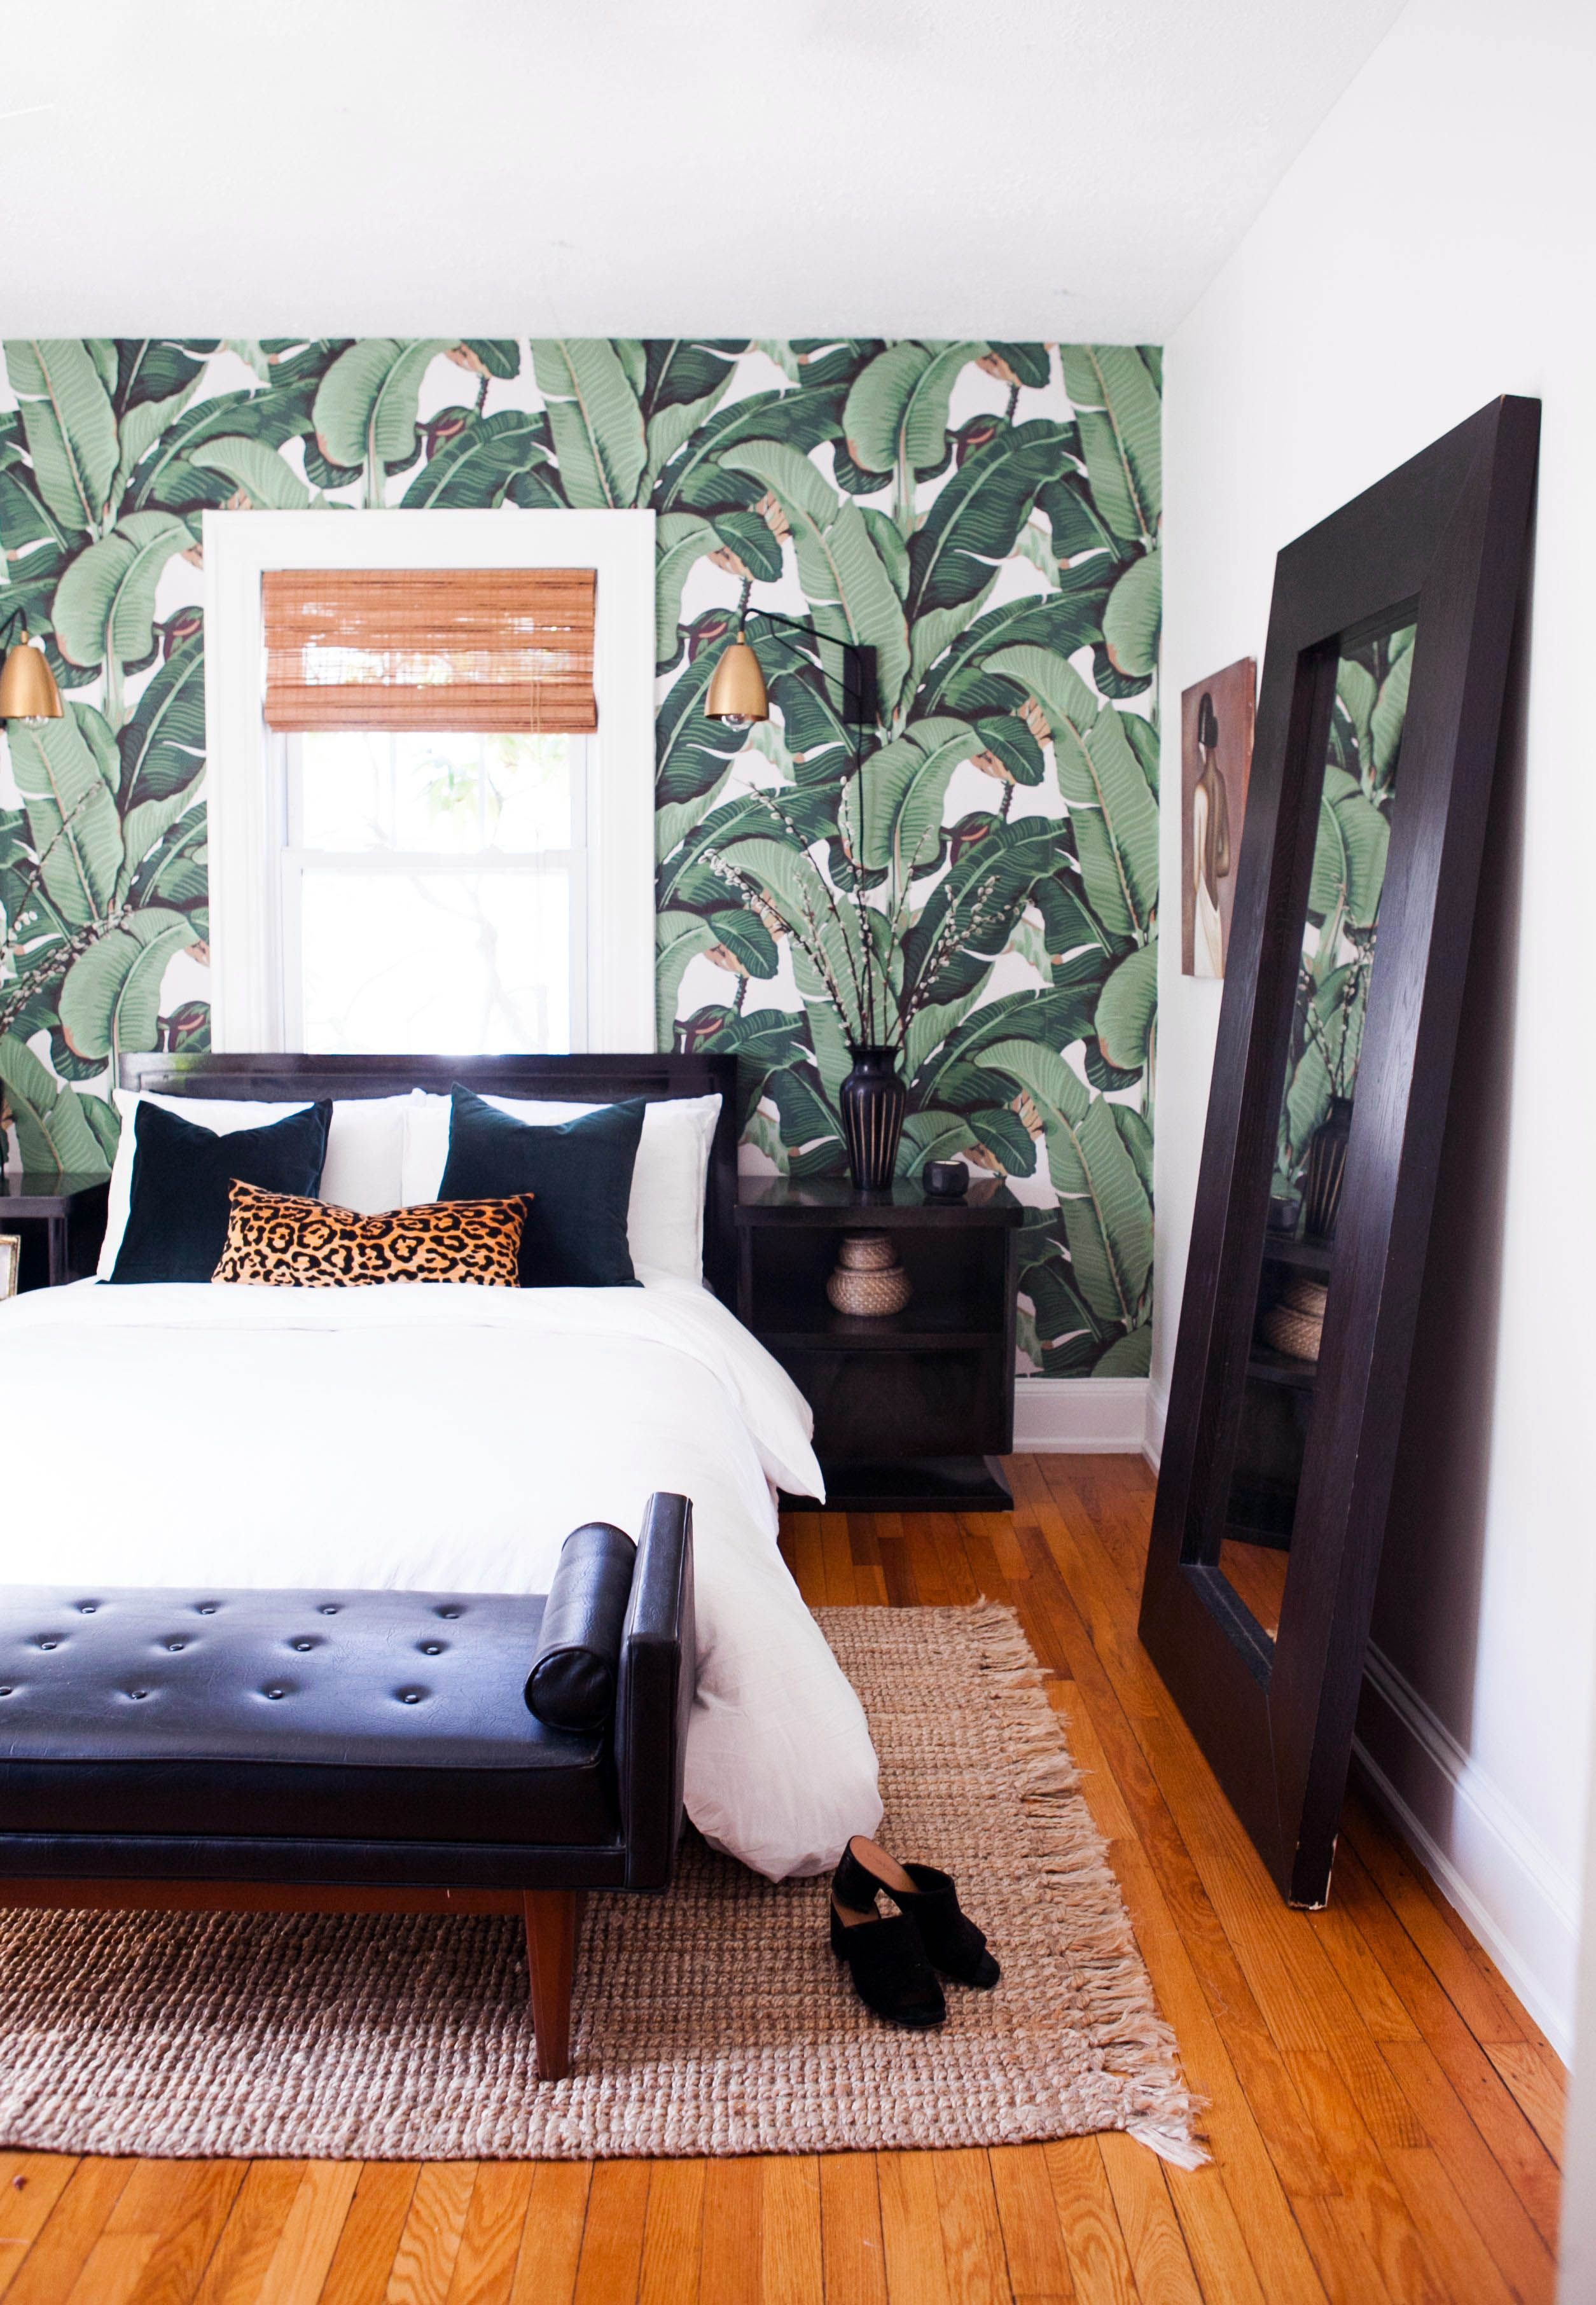 Neutral Bedroom Furniture Sets Sale In Karachi Just On Homesable Com Bedroomfurnitureforsaleinkarachi Bedroomfurniturekarachi Stylish Bedroom Design